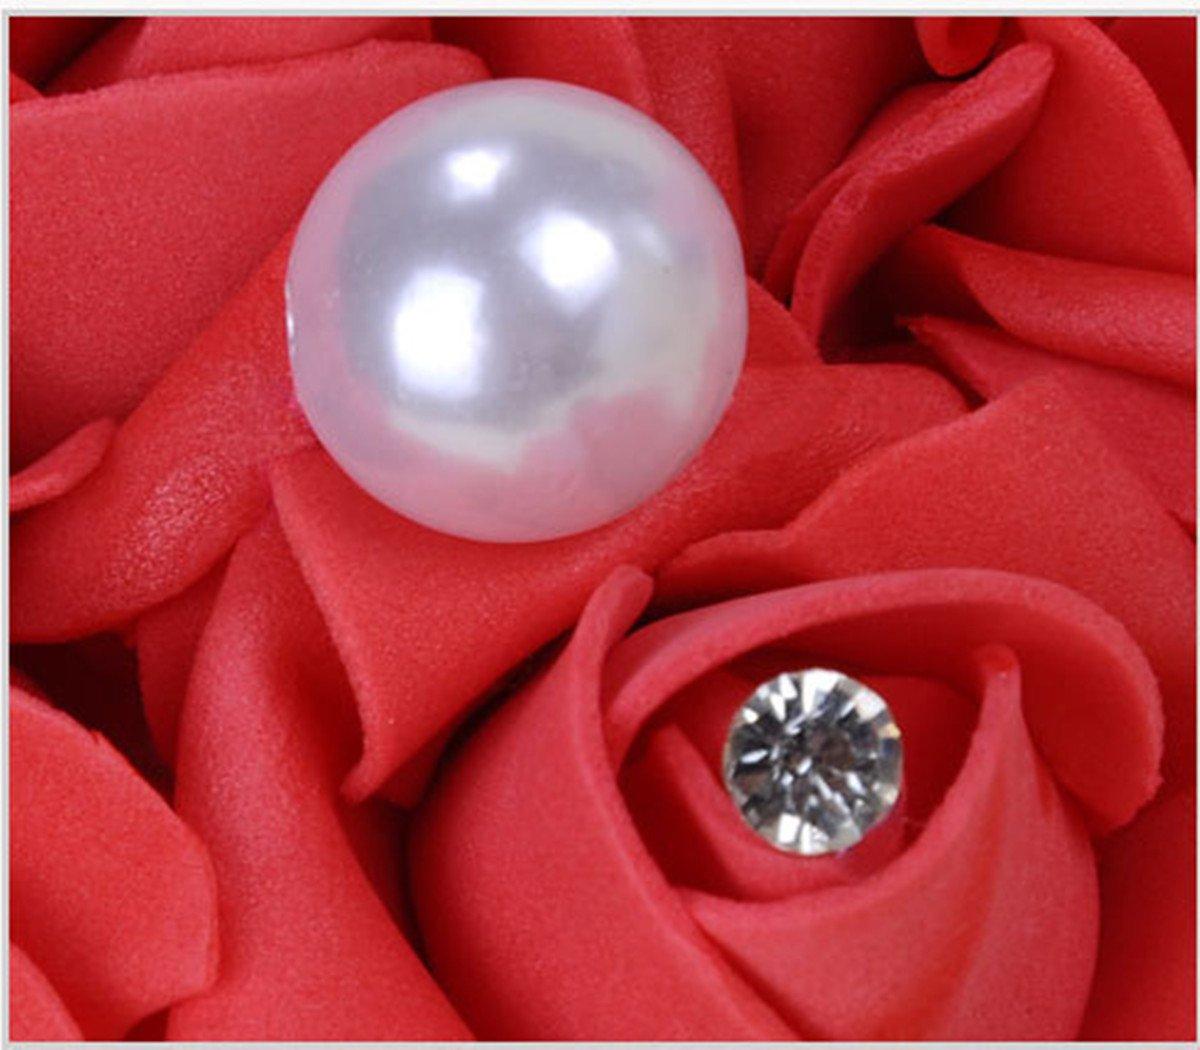 Mystery/&Melody Bo/îte /à Bijoux en Forme de Coussin de bo/îte /à Bijoux en Forme de Coussin Rose